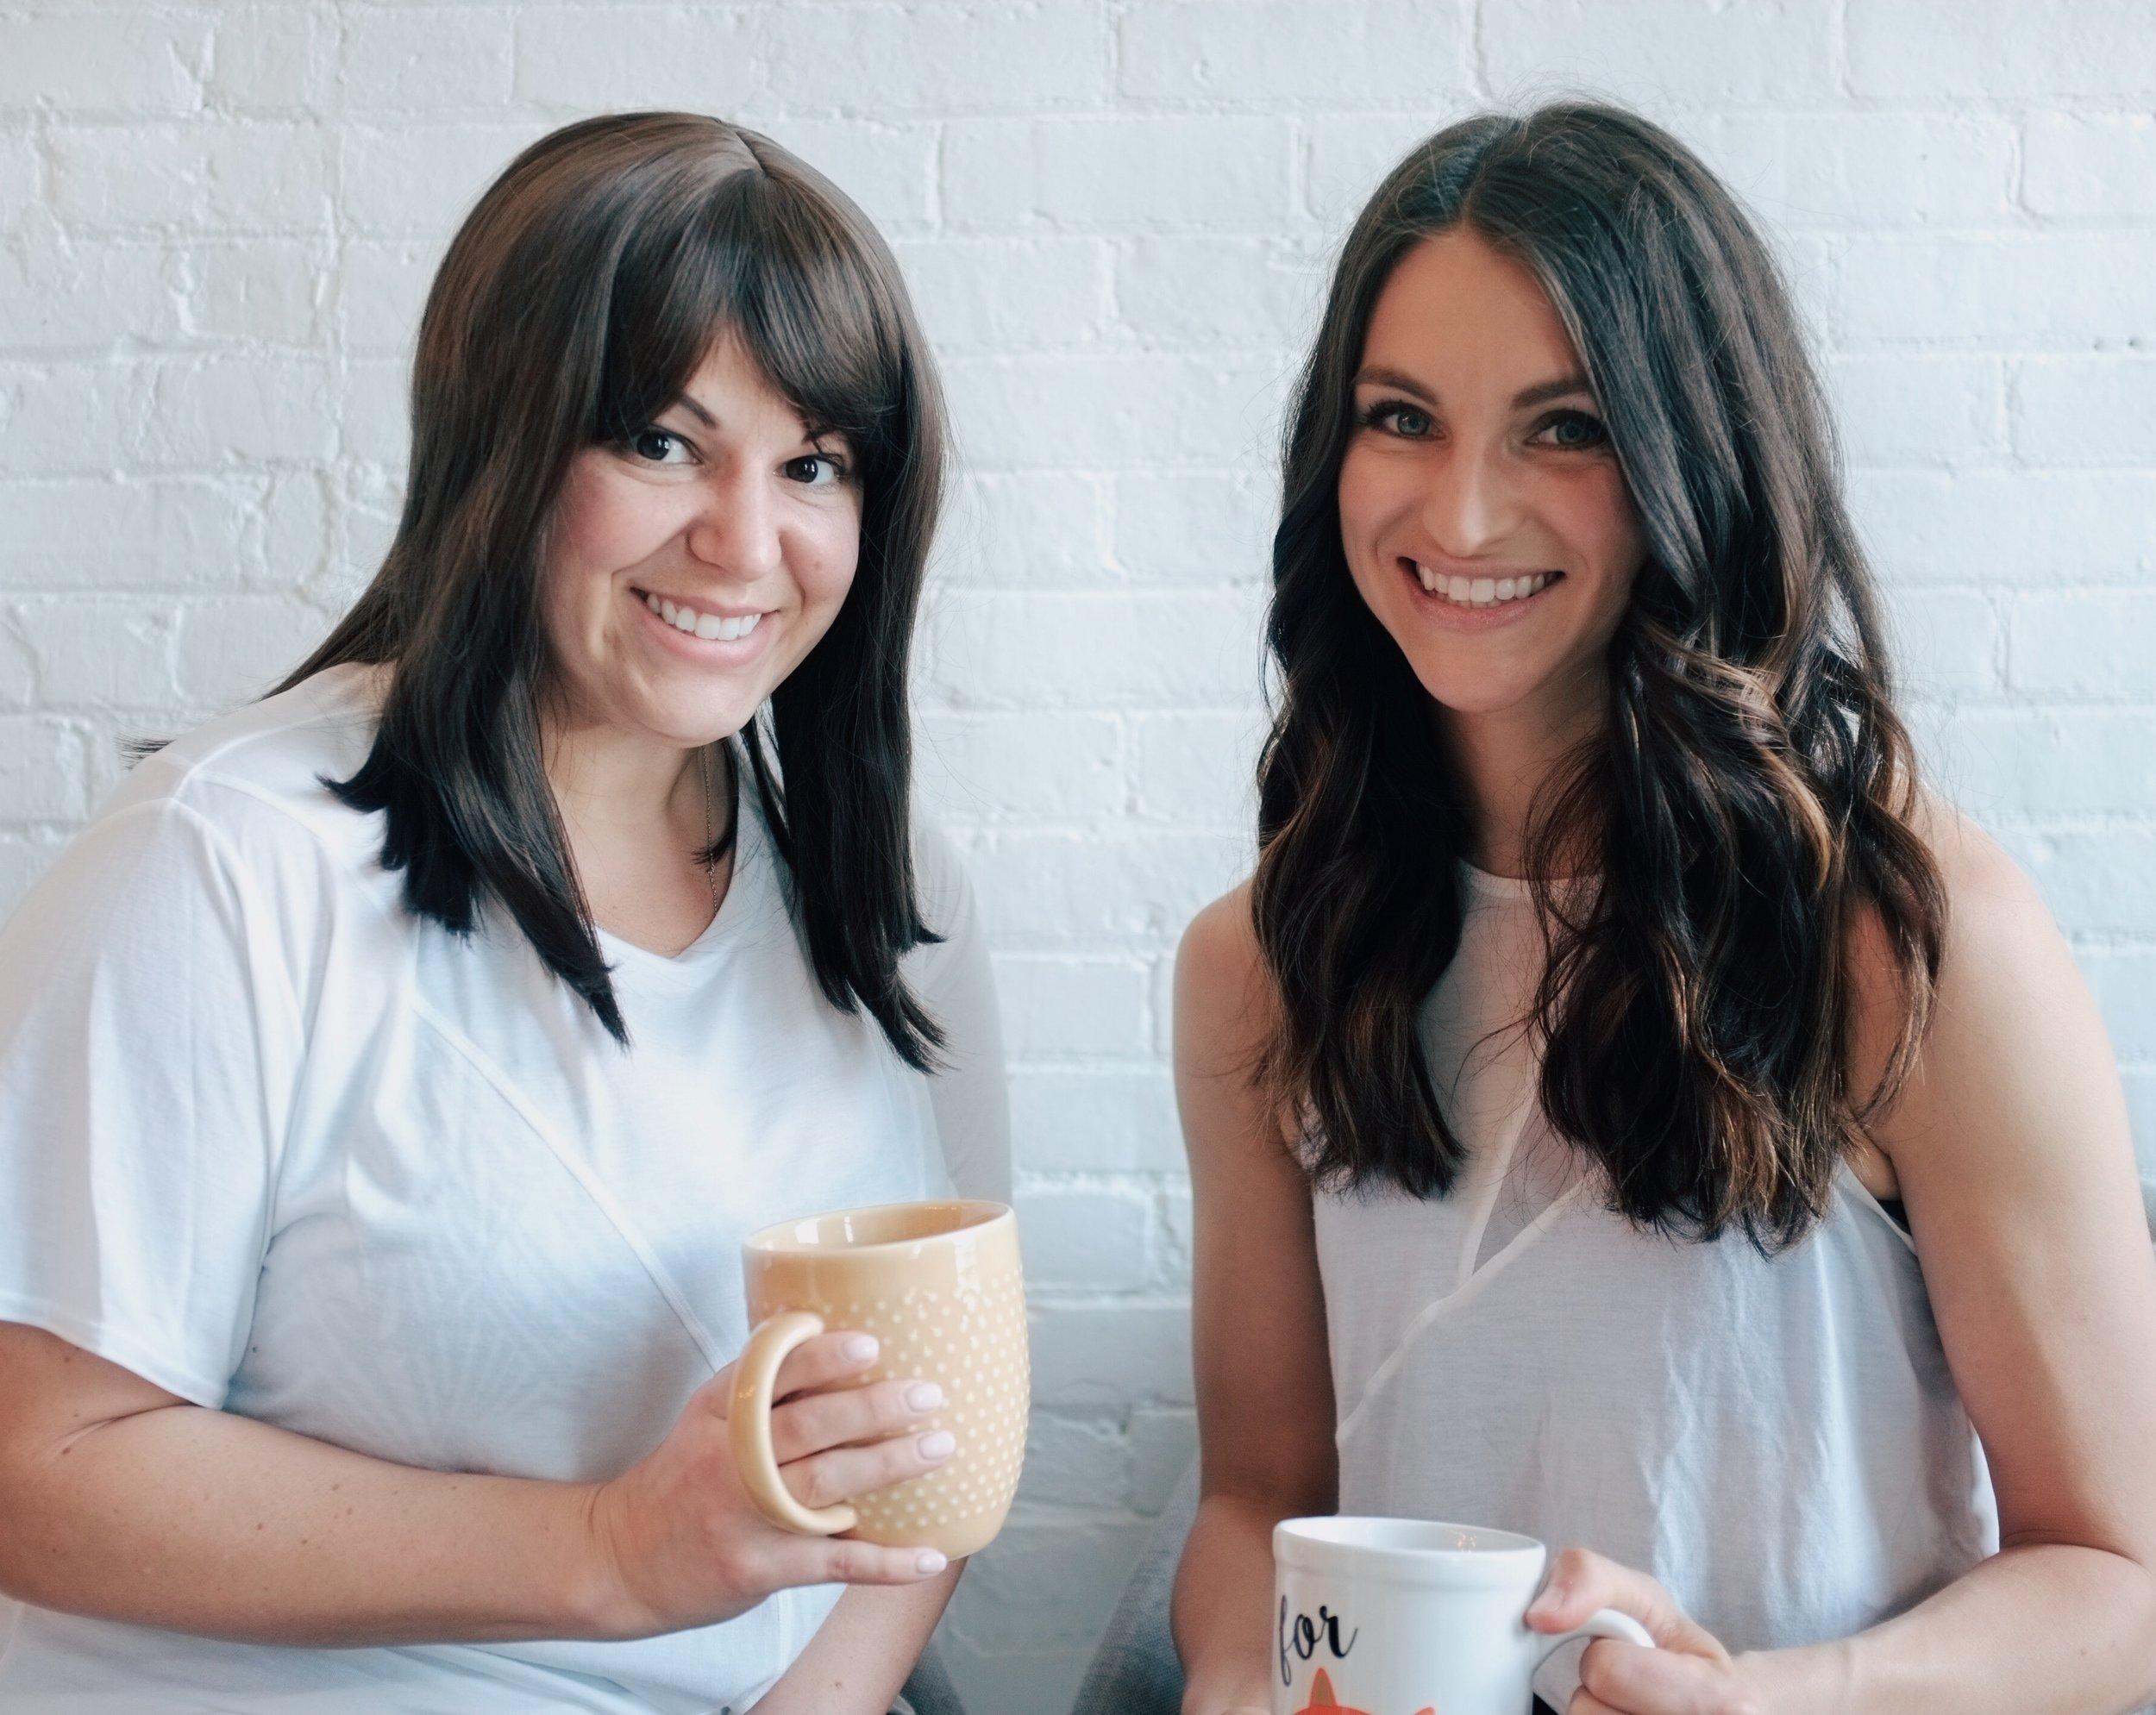 The beauty Boost in Cincinnati, Ohio with Rachel Kerr.